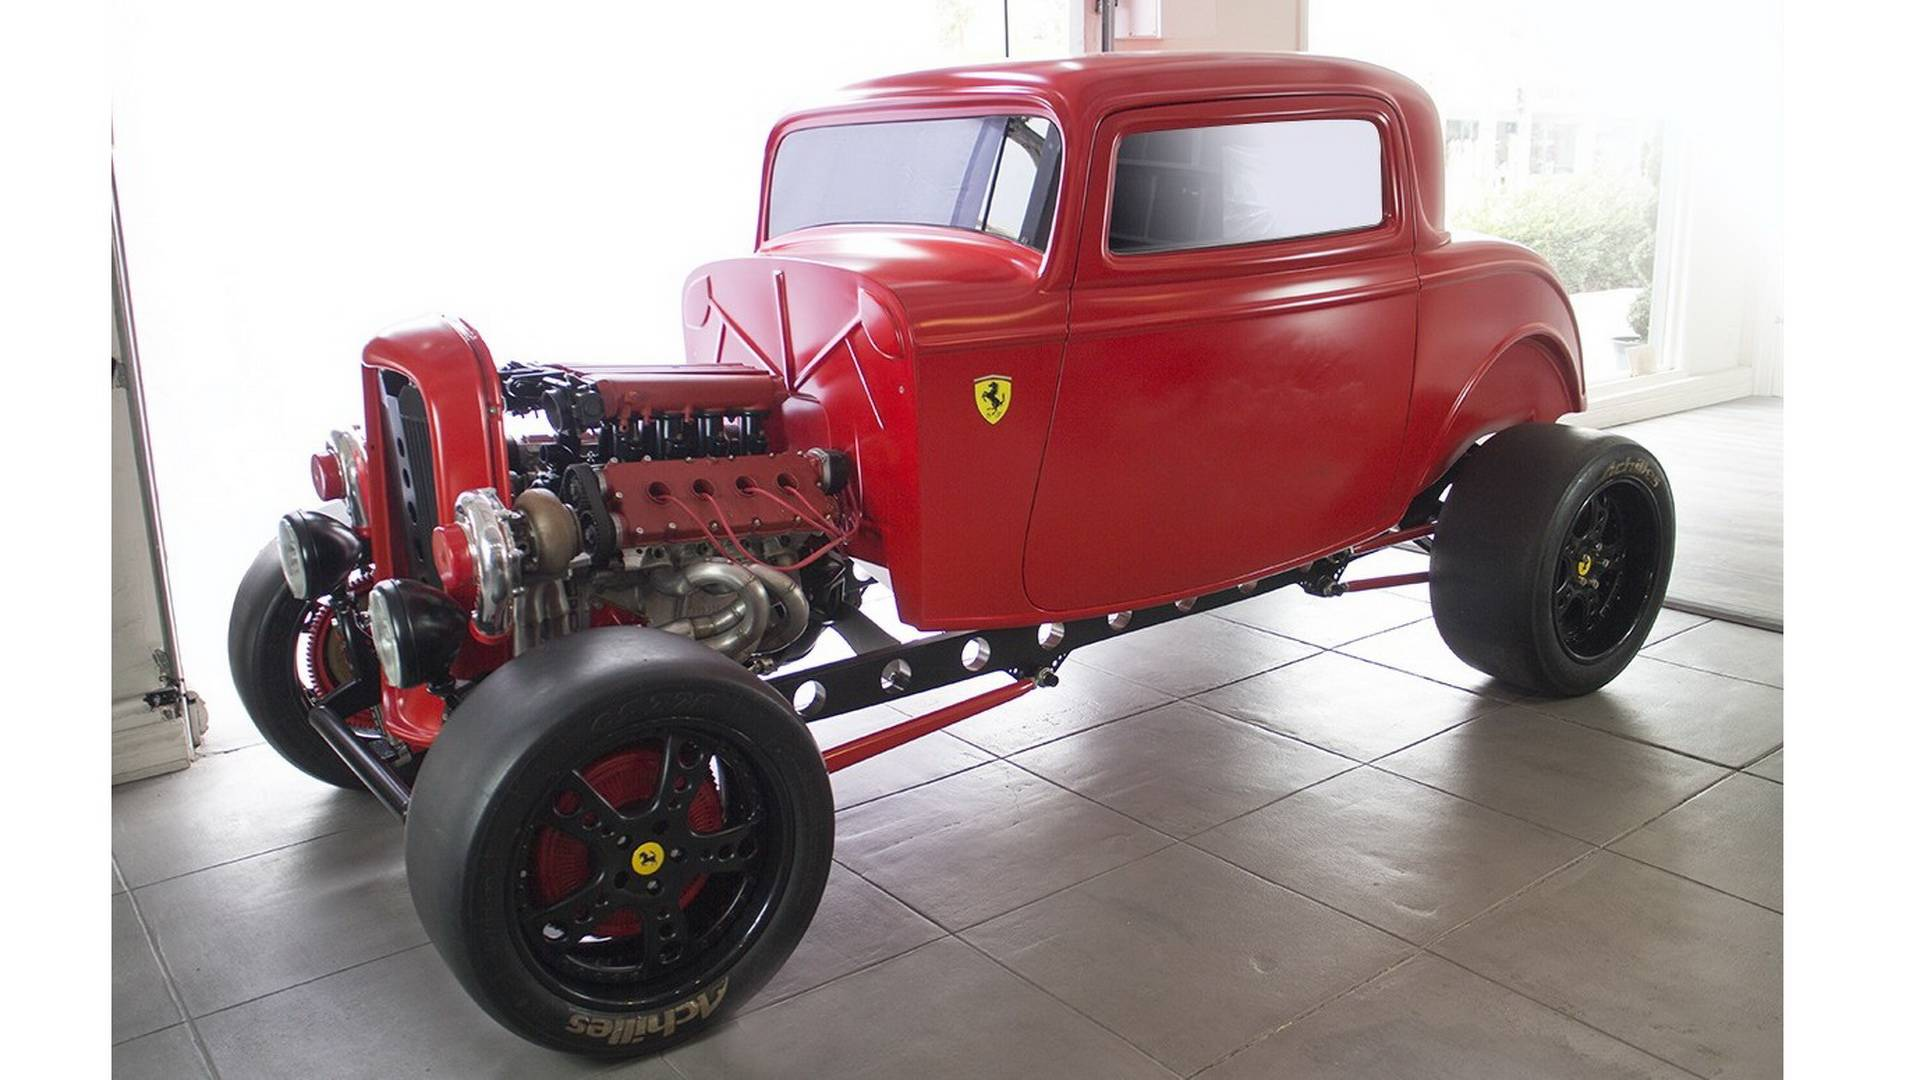 1932 Ford With 950 HP Biturbo Ferrari Engine Is Retro Crazy